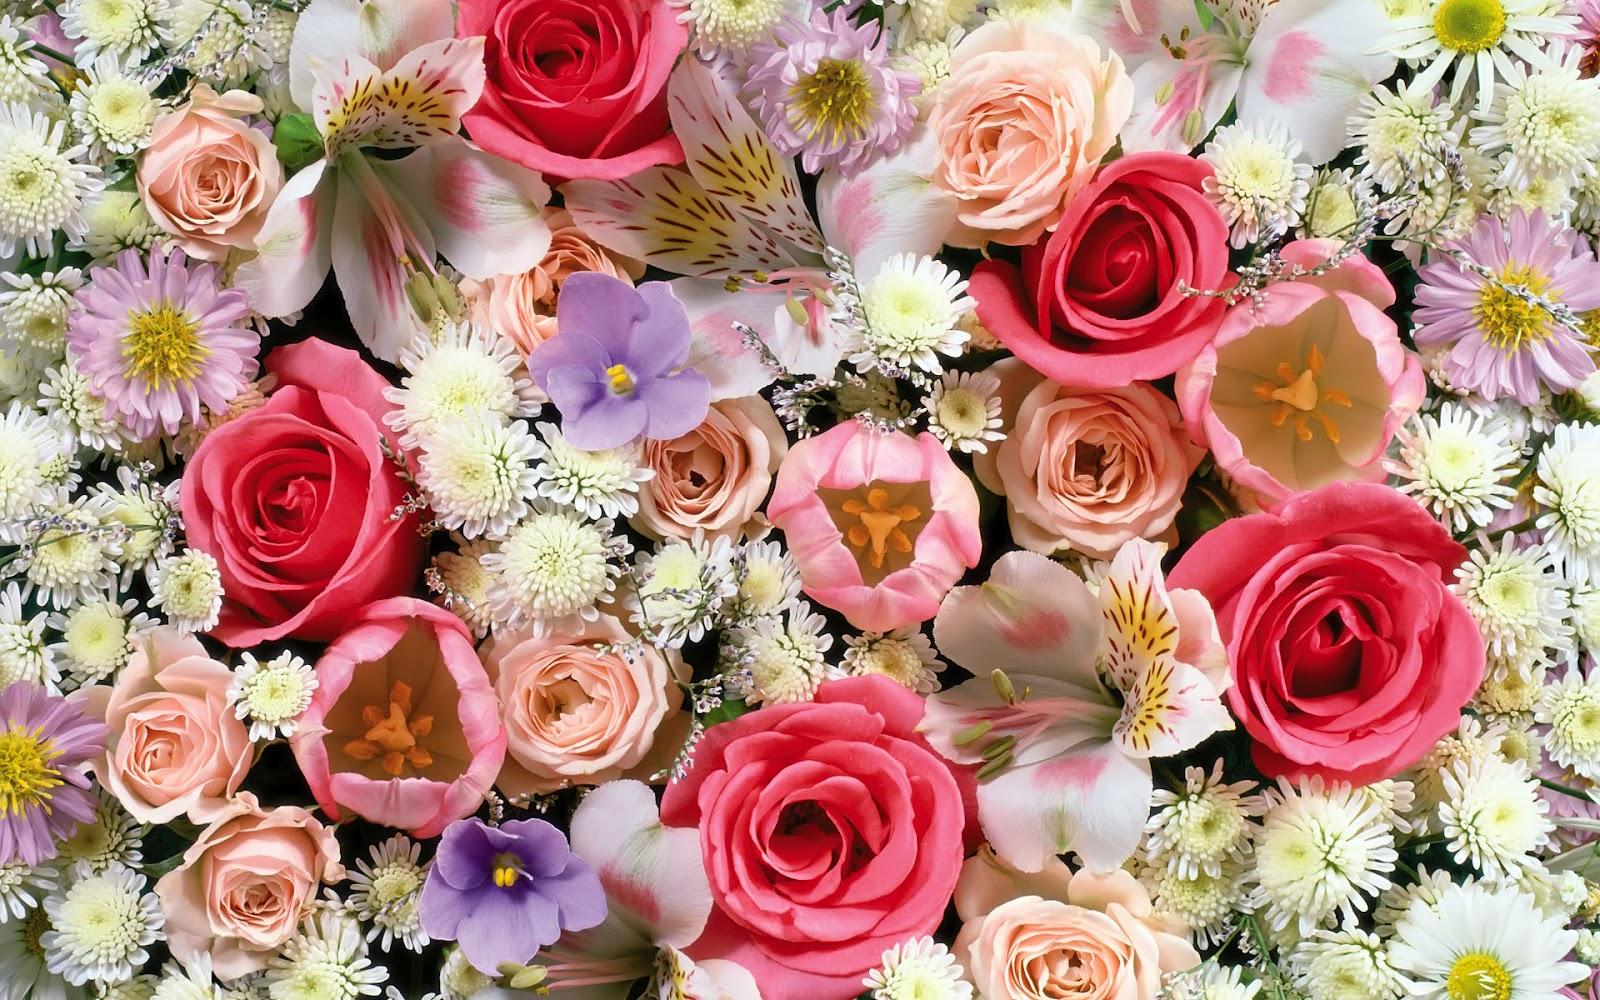 Holi 3d Wallpaper Name Flowers Wallpapers Flower Wallpaper Top Best Hd